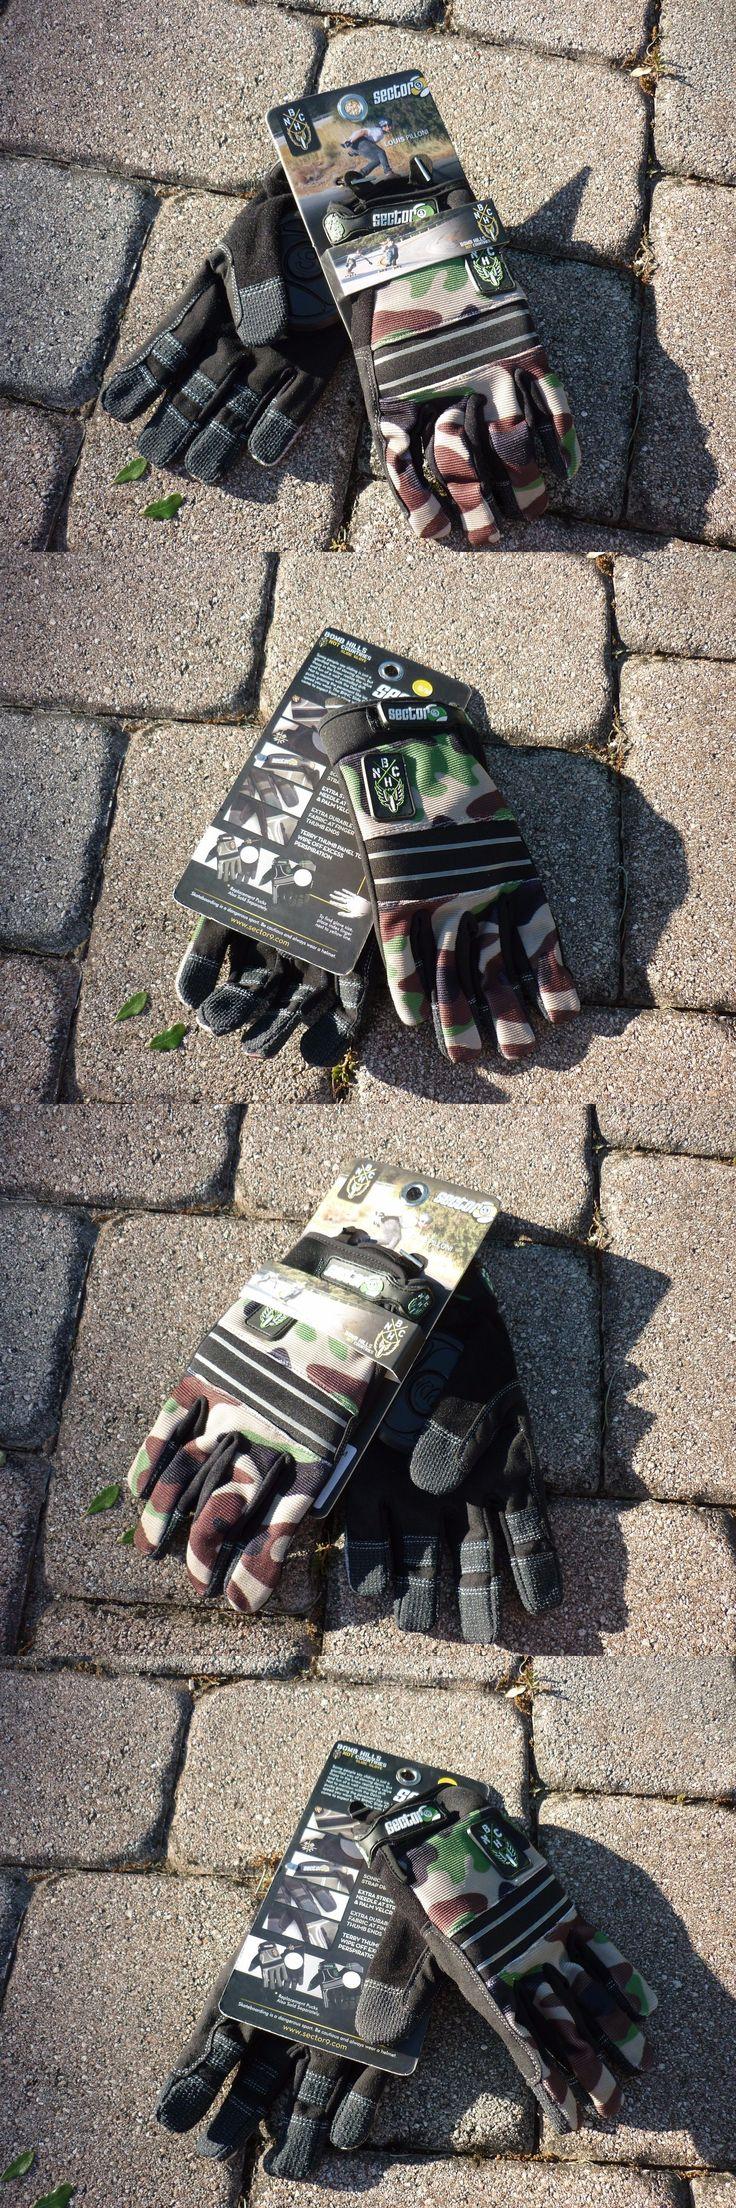 Wheels 165946: New Sector 9 Camo Bhnc Slide Gloves Longboard Skateboard Small Medium Sm M -> BUY IT NOW ONLY: $34.99 on eBay!